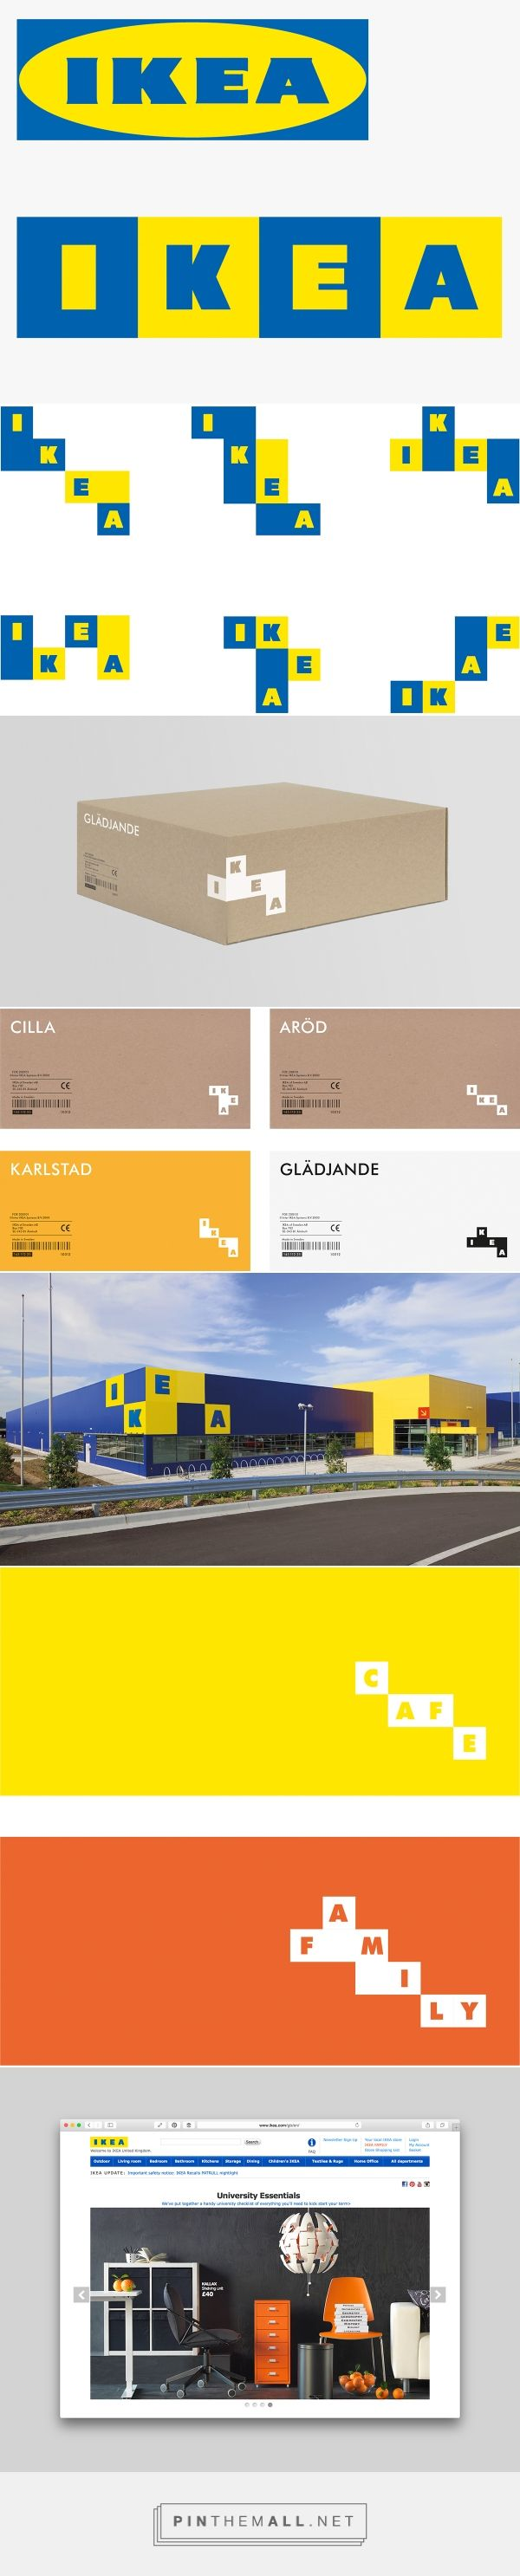 Rethinking IKEA's logo on Behance - created via https://pinthemall.net